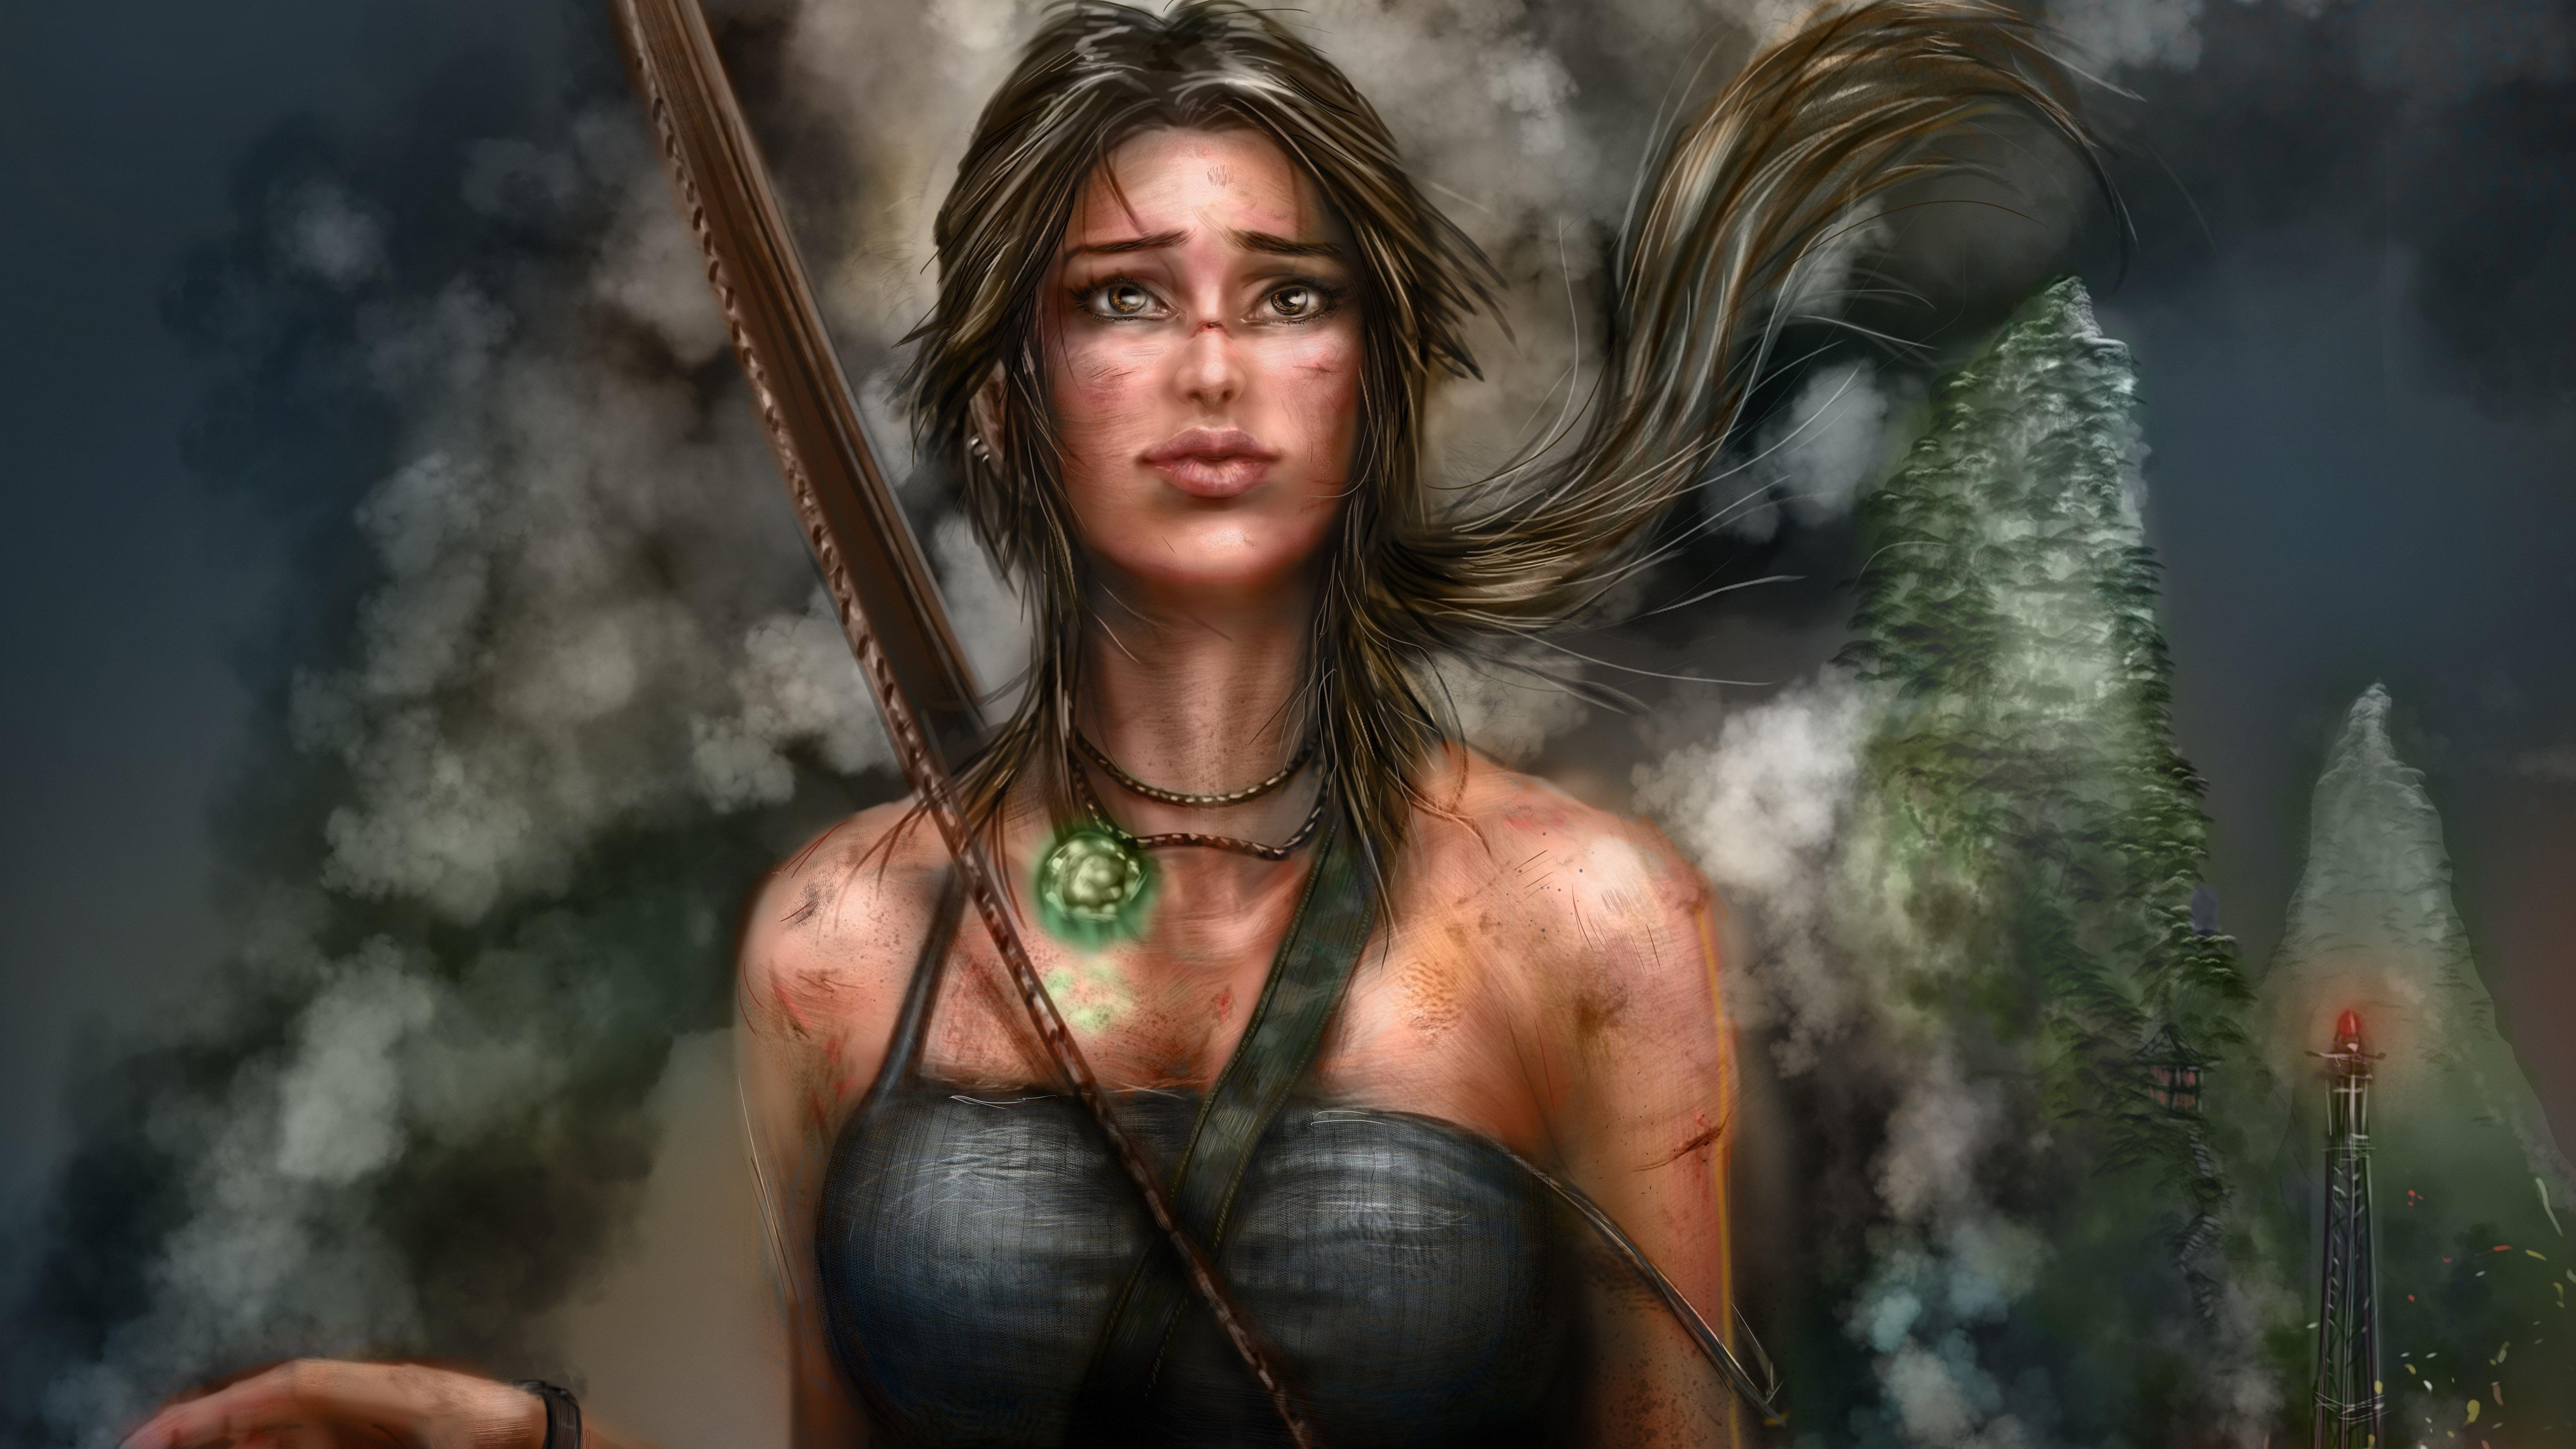 7680x4320 Lara Croft 8k Artwork 8k Hd 4k Wallpapers: 1920x1080 Lara Croft Artworks 5k Laptop Full HD 1080P HD